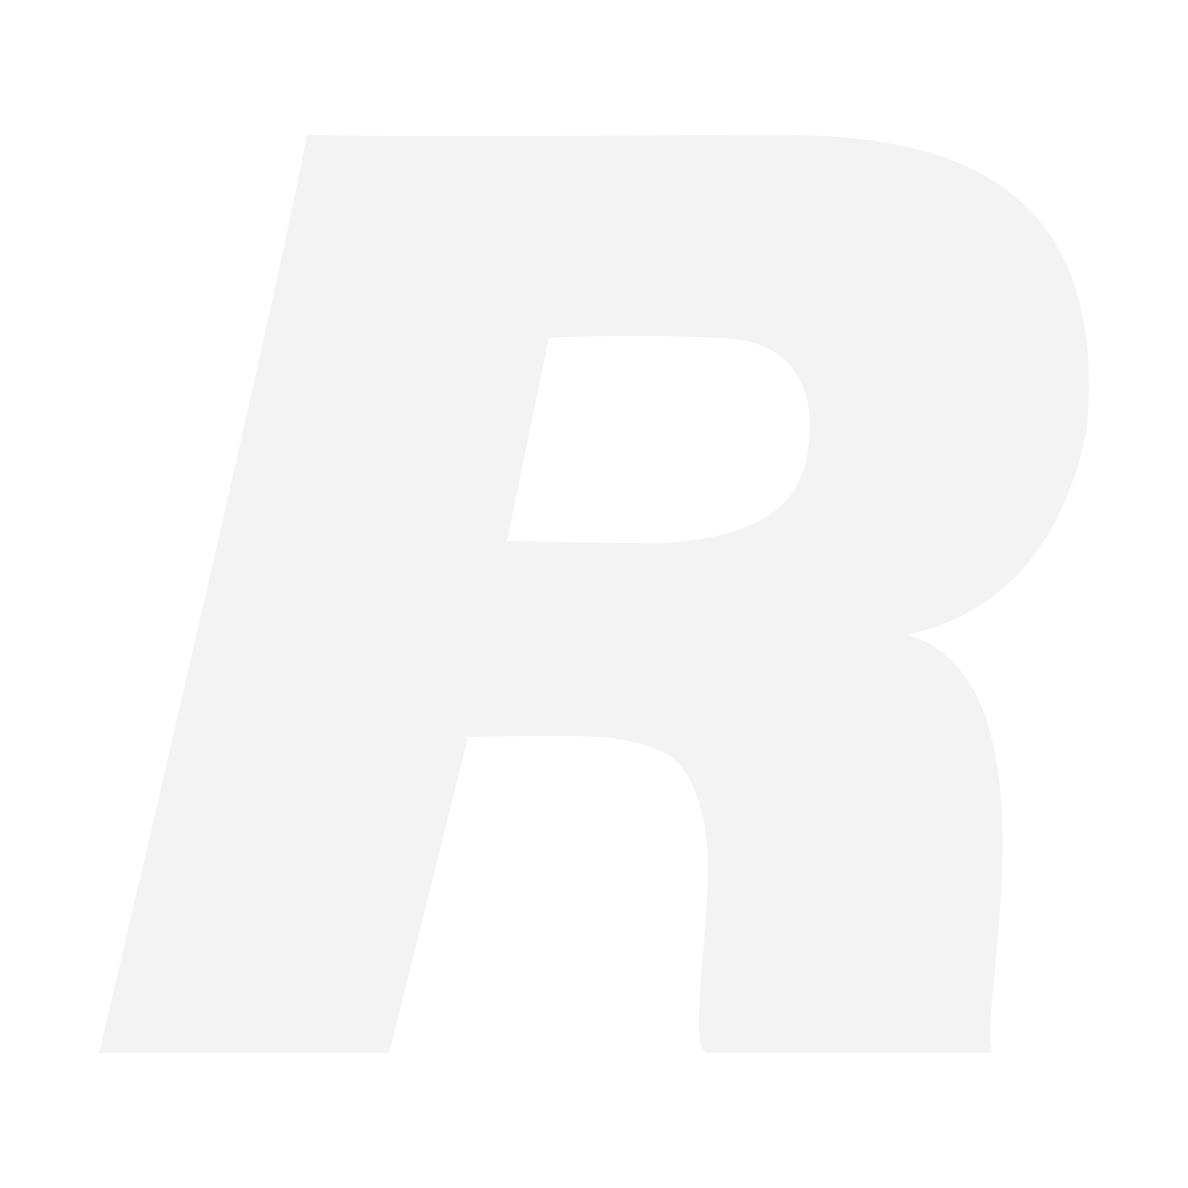 OLYMPUS MCG-2 Grip (P3) POISTOTUOTE